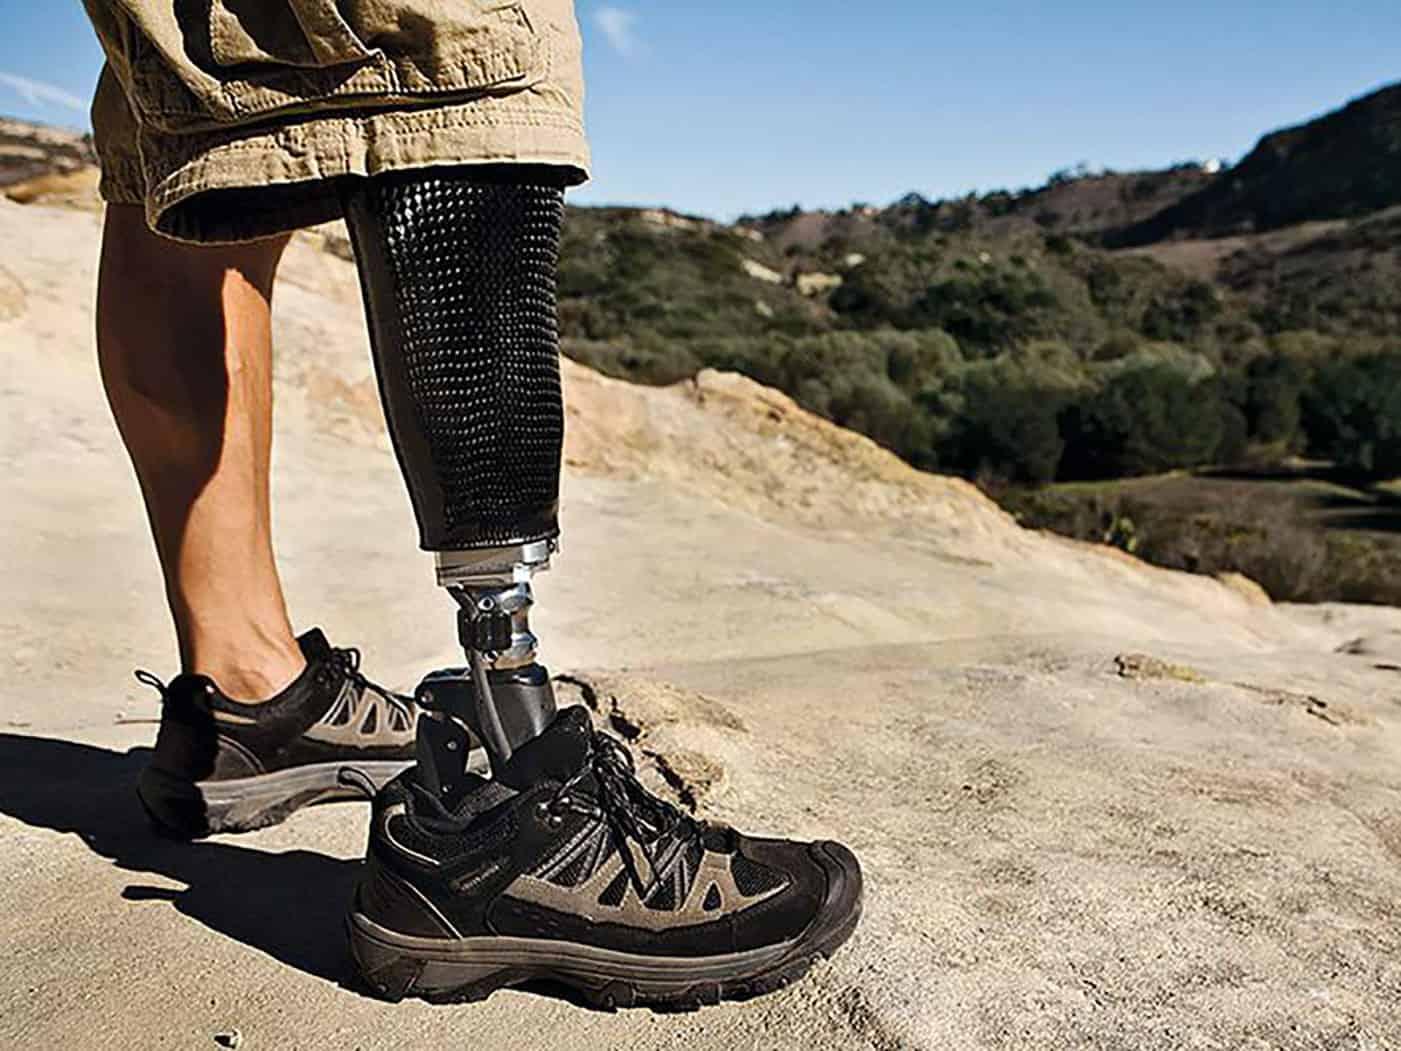 presidio neri team - protesi gamba piede